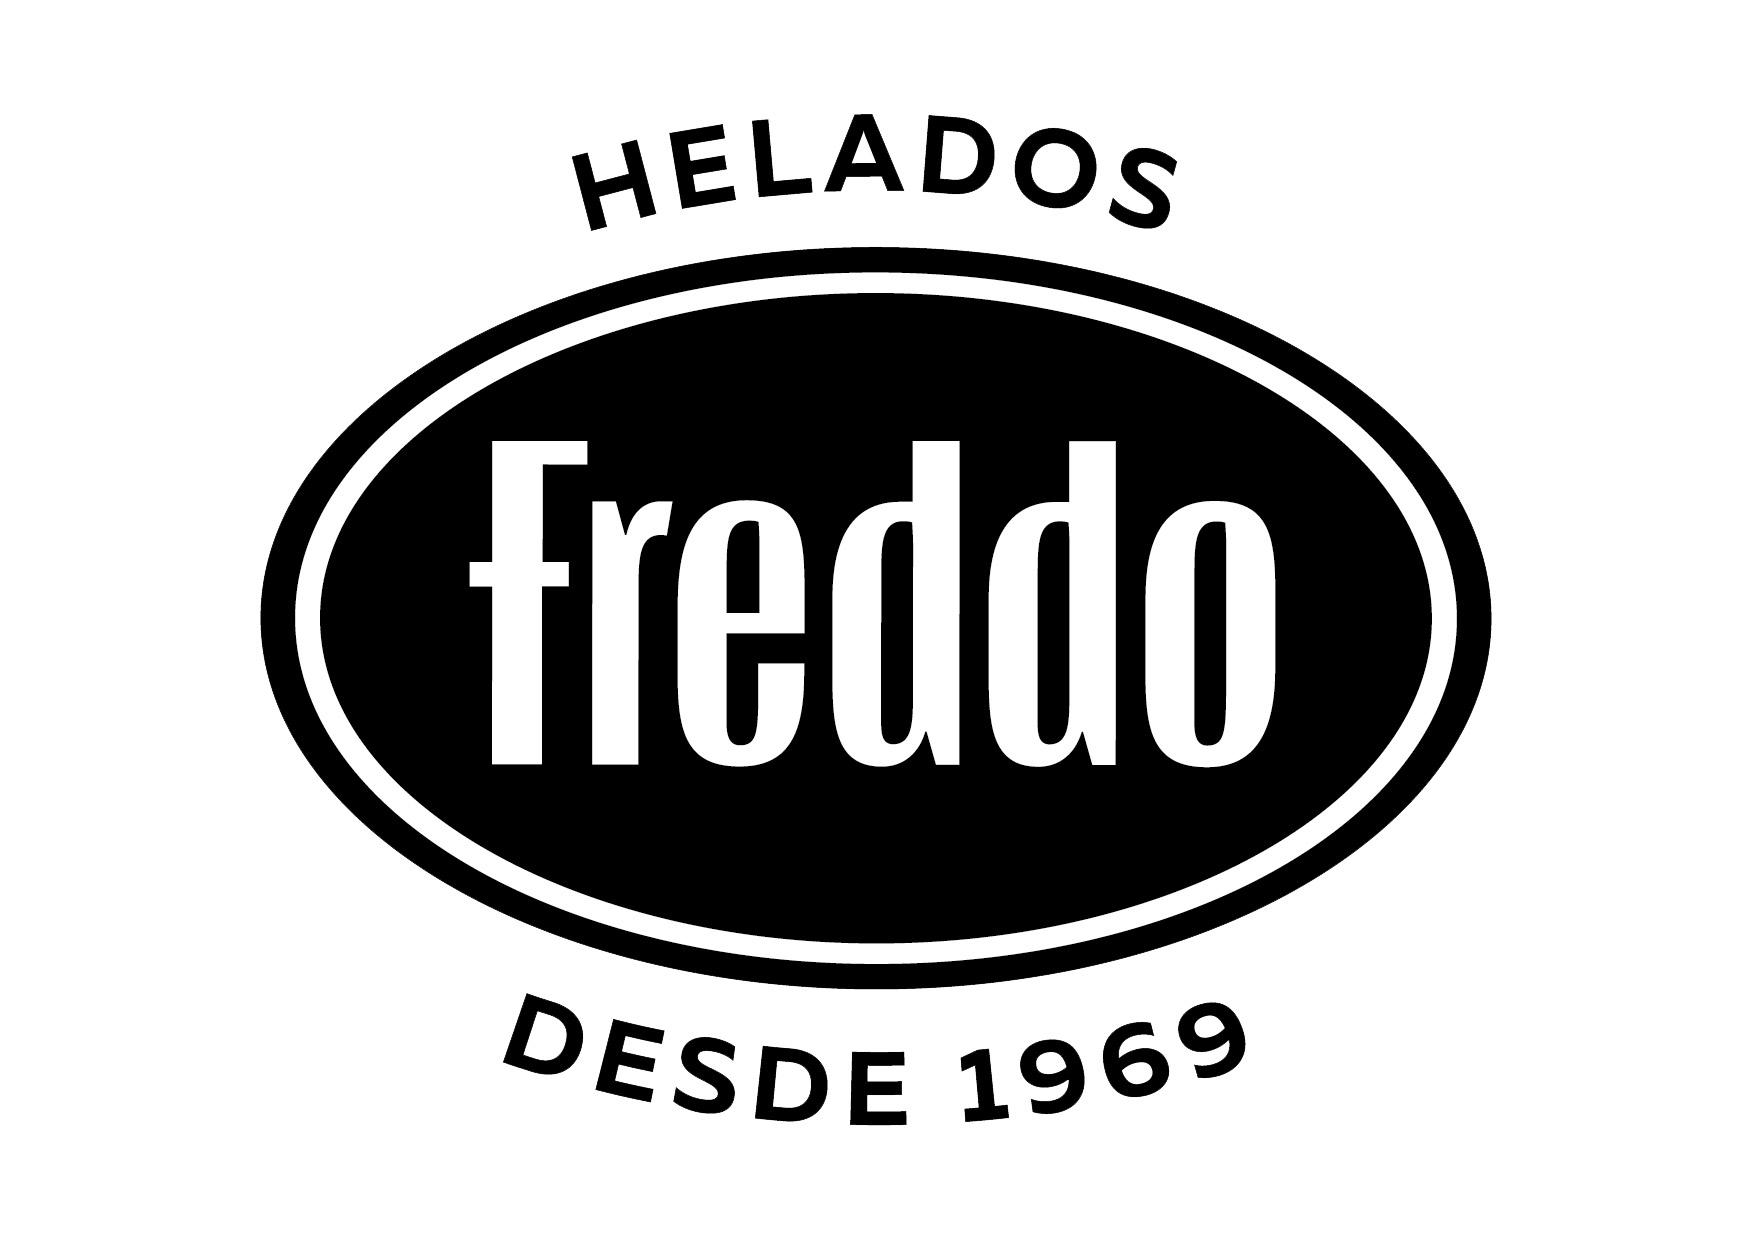 Helados Freddo